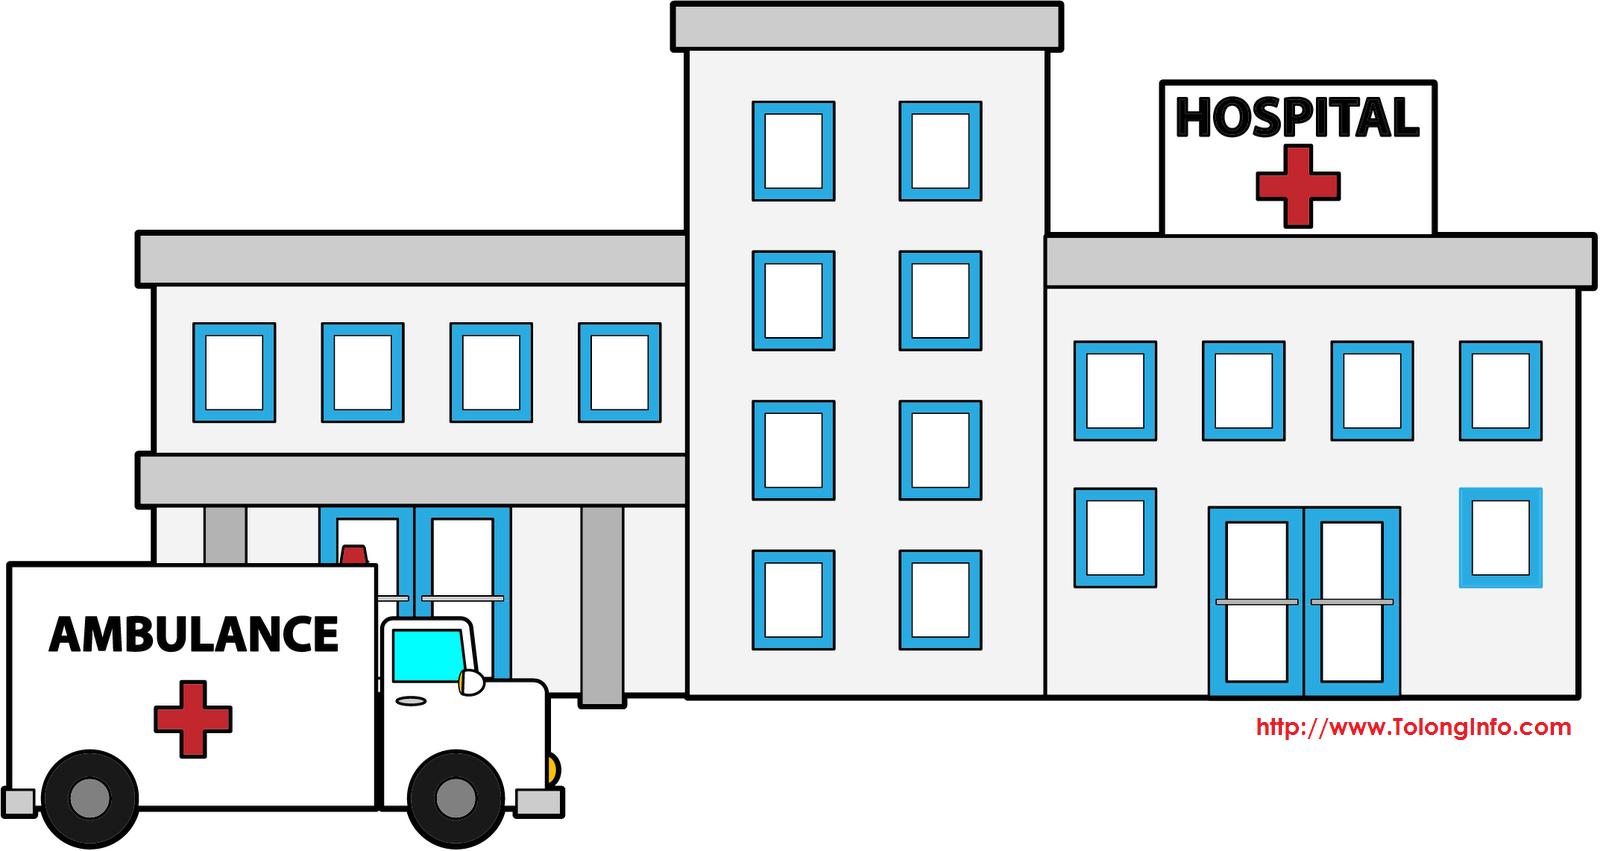 6400 Gambar Kartun Gedung Rumah Sakit HD Gambar